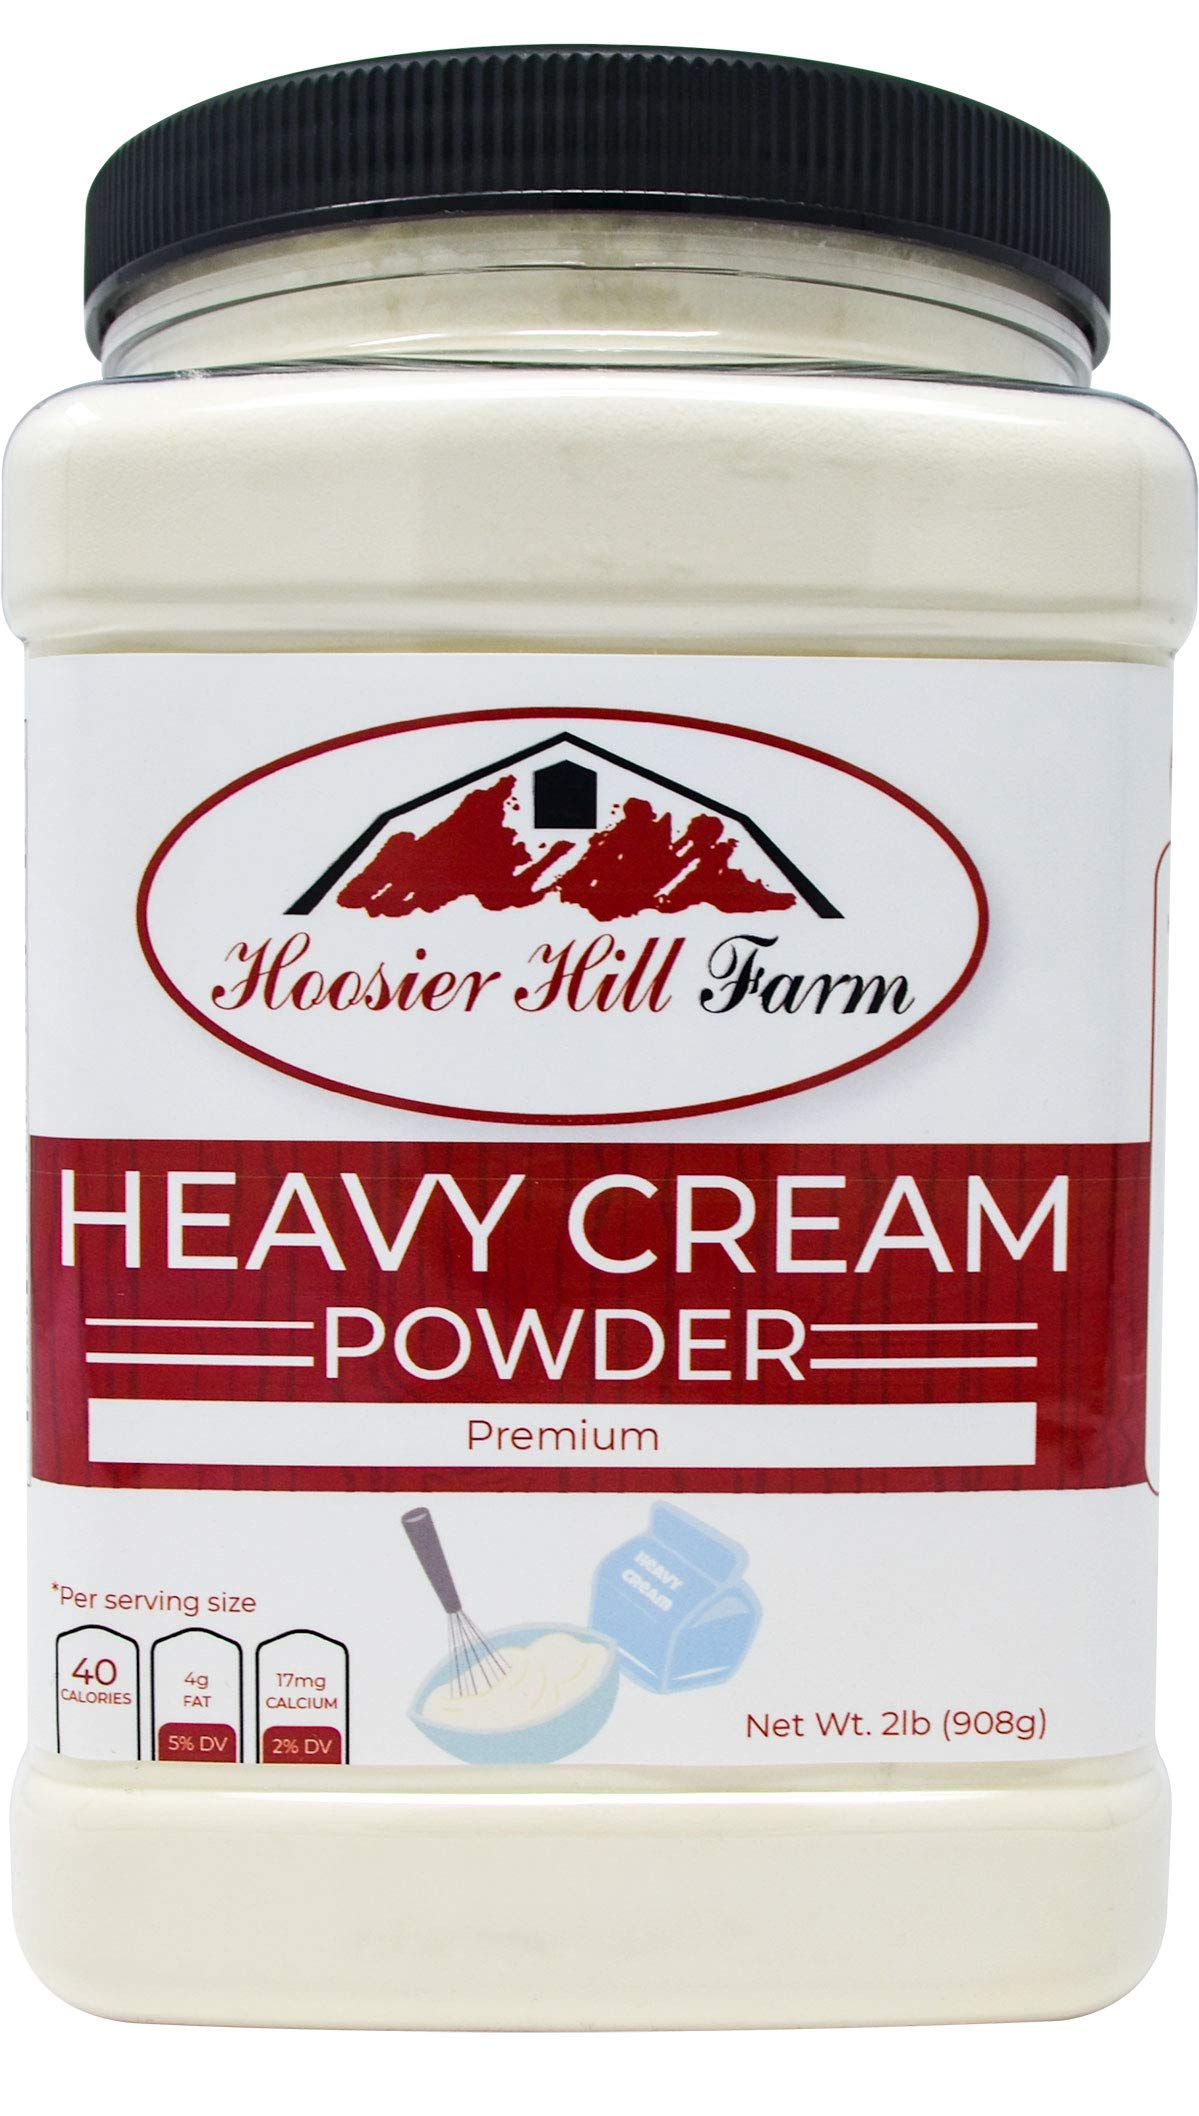 Heavy Cream Powder Jar, Hoosier Hill Farm (2 lbs) Gluten Free and Hormone Free.